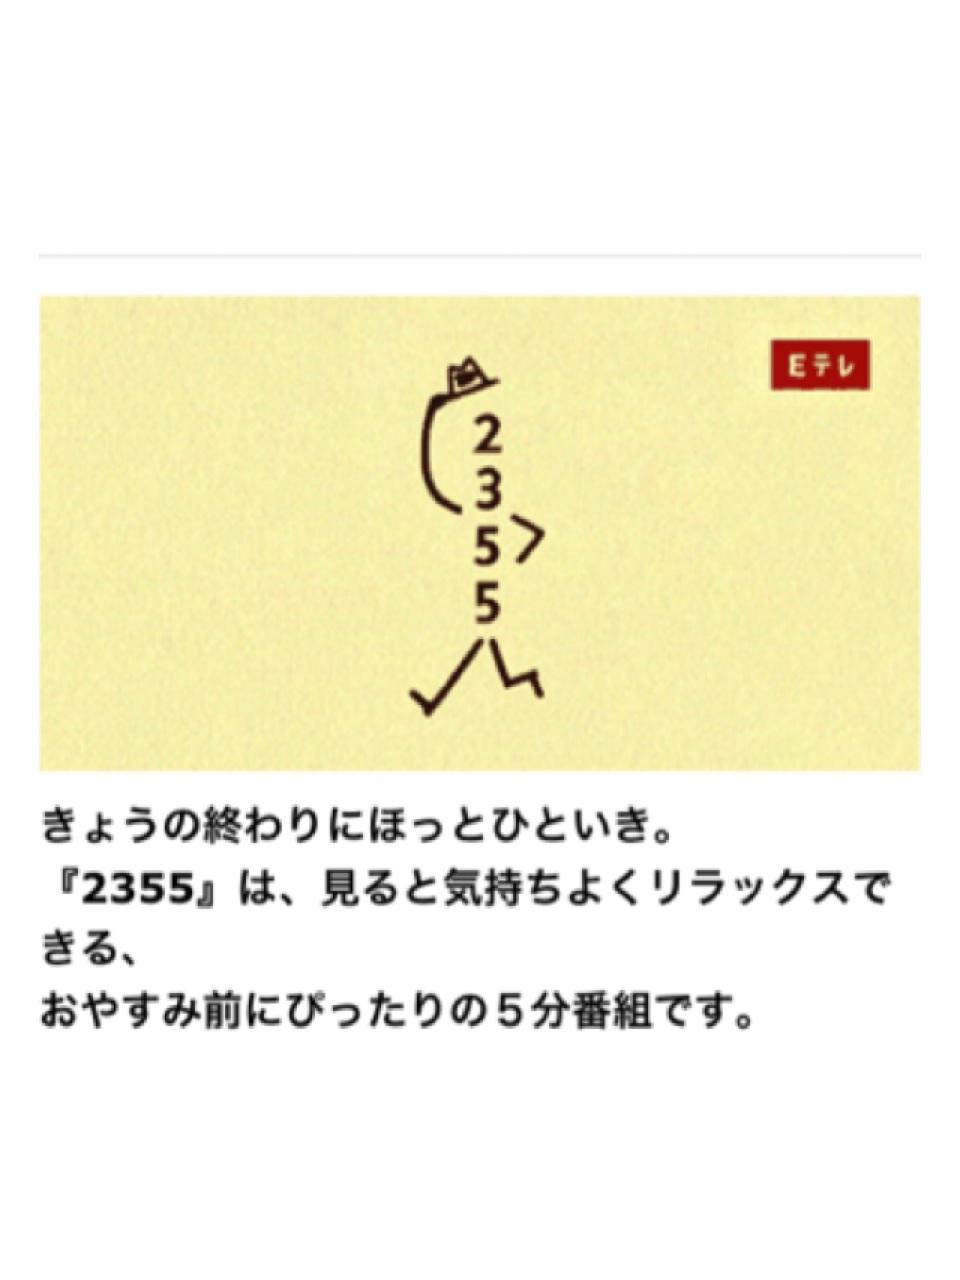 NHKの番組『2355 0655』がゆるくておもしろい件